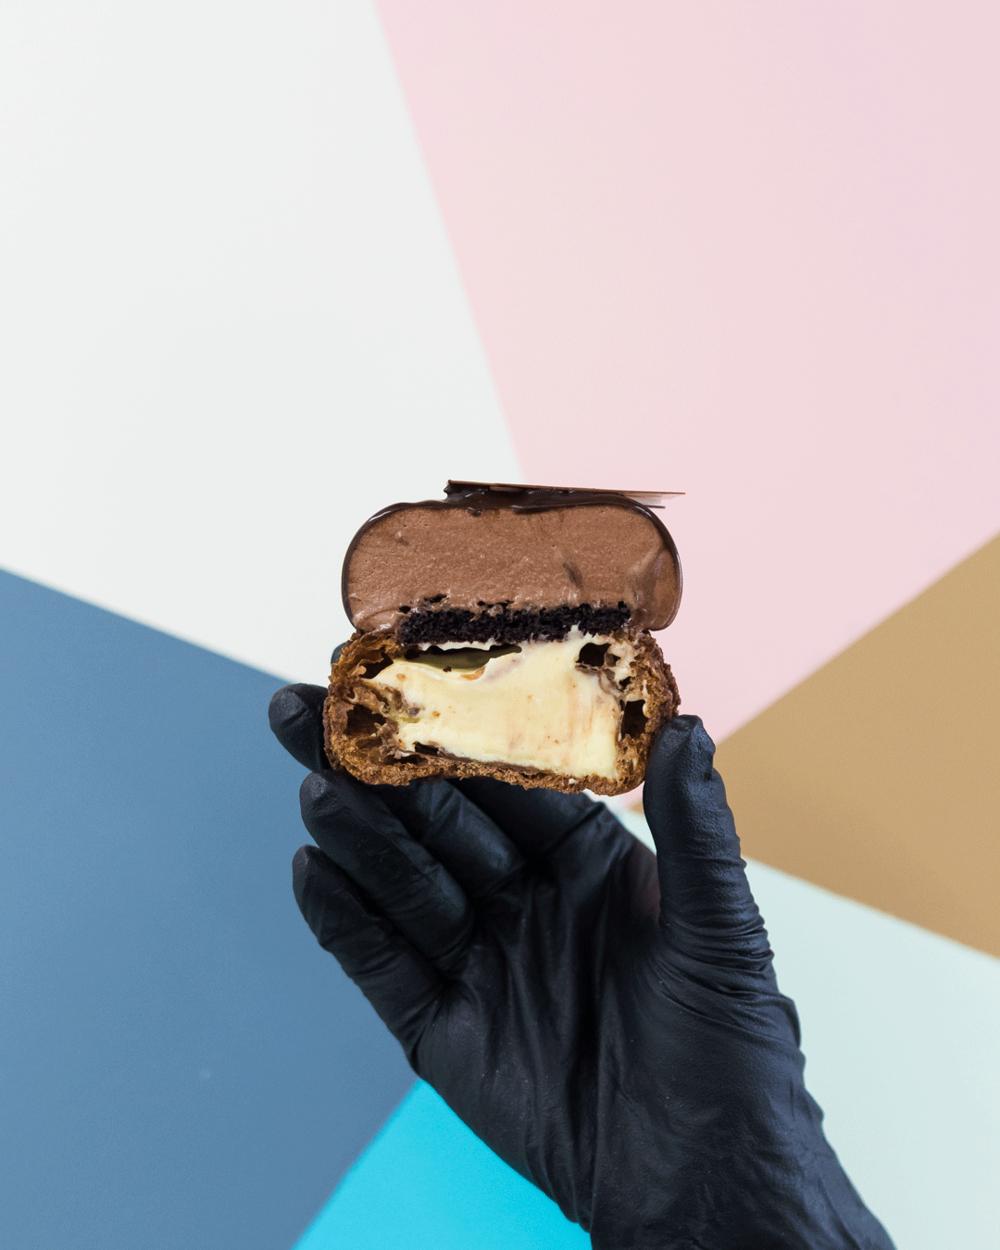 The Genius Behind Beta5 Chocolates' Creampuffs - DISH HIGHLIGHT